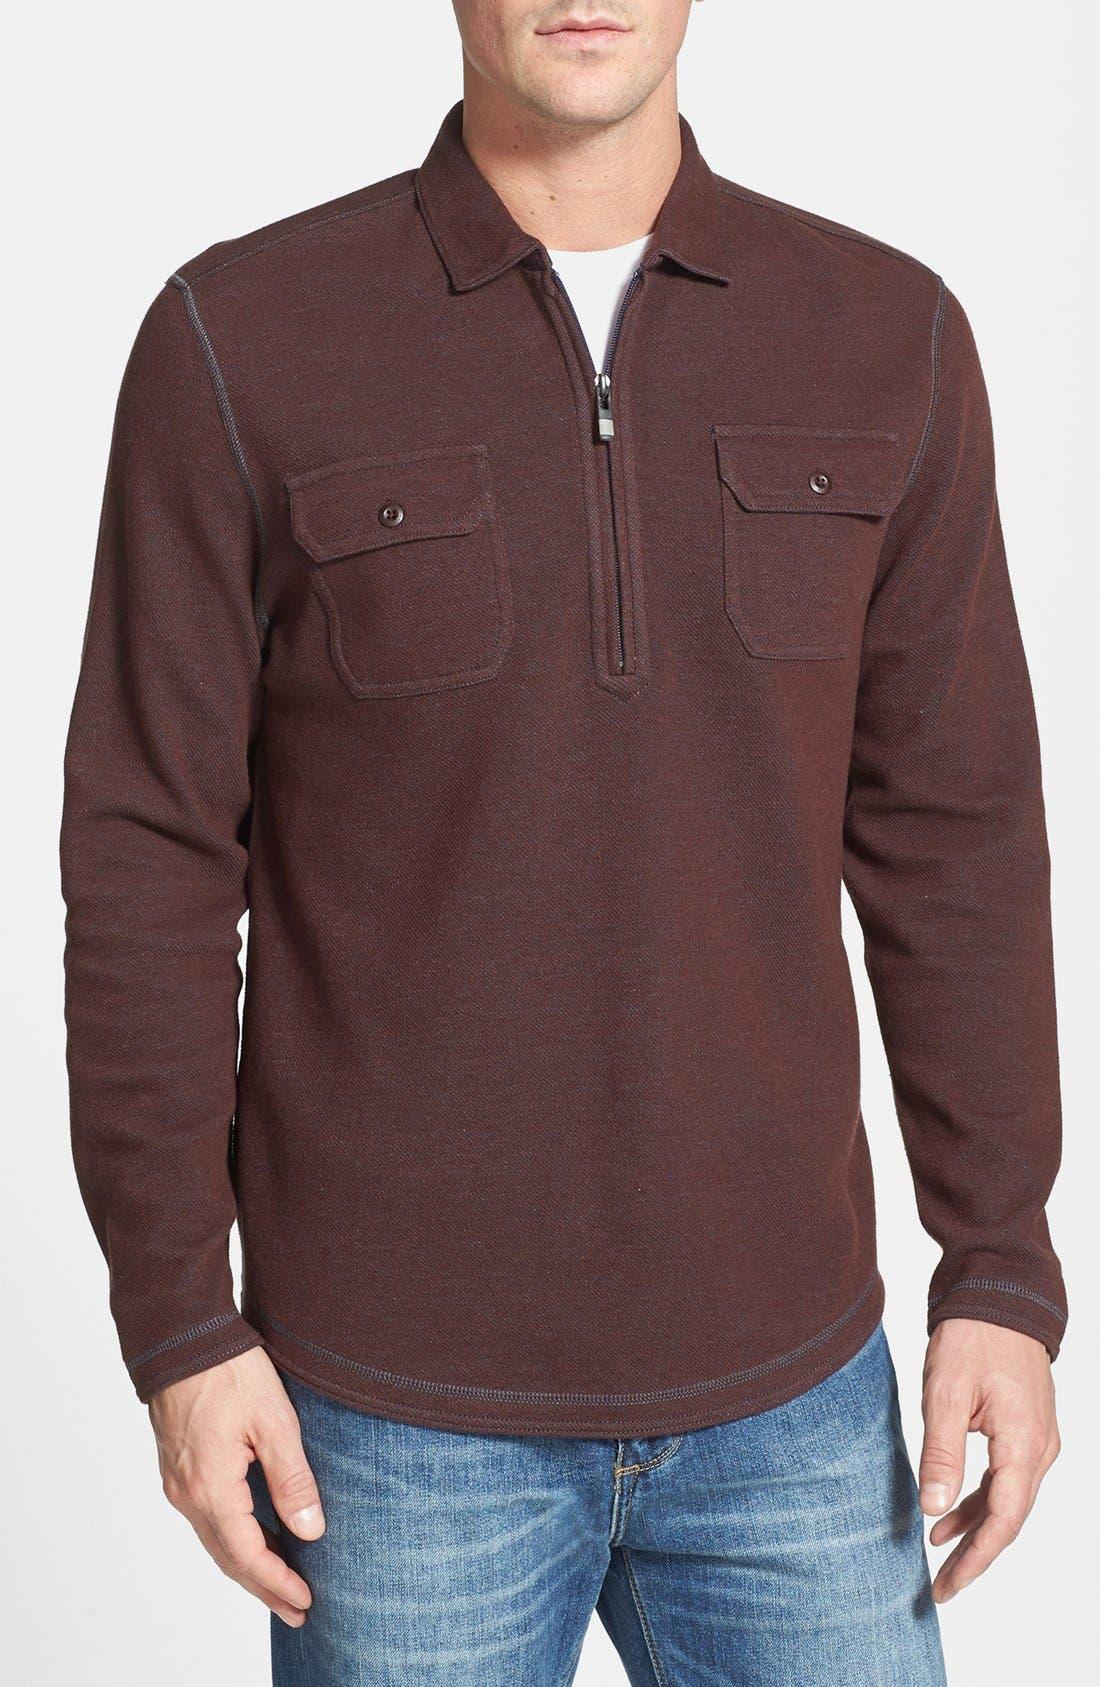 Alternate Image 1 Selected - Tommy Bahama Denim 'Bob Twillin' Island Modern Fit Half Zip Sweatshirt